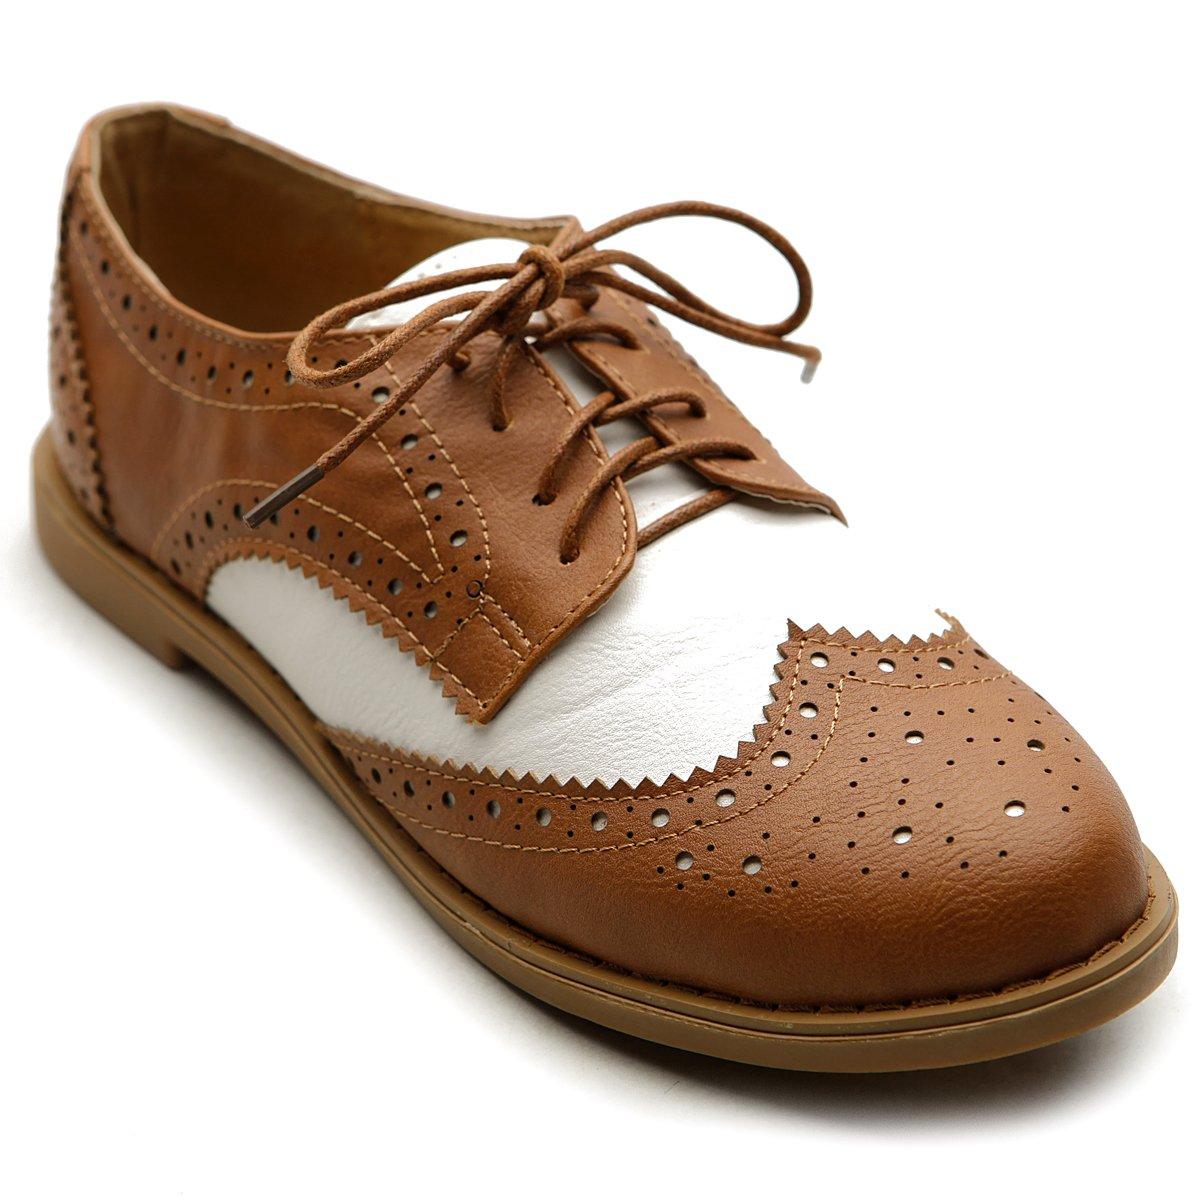 Ollio Women's Flat Shoe Wingtip Lace Up Two Tone Oxford M2913(9 B(M) US, Brown)